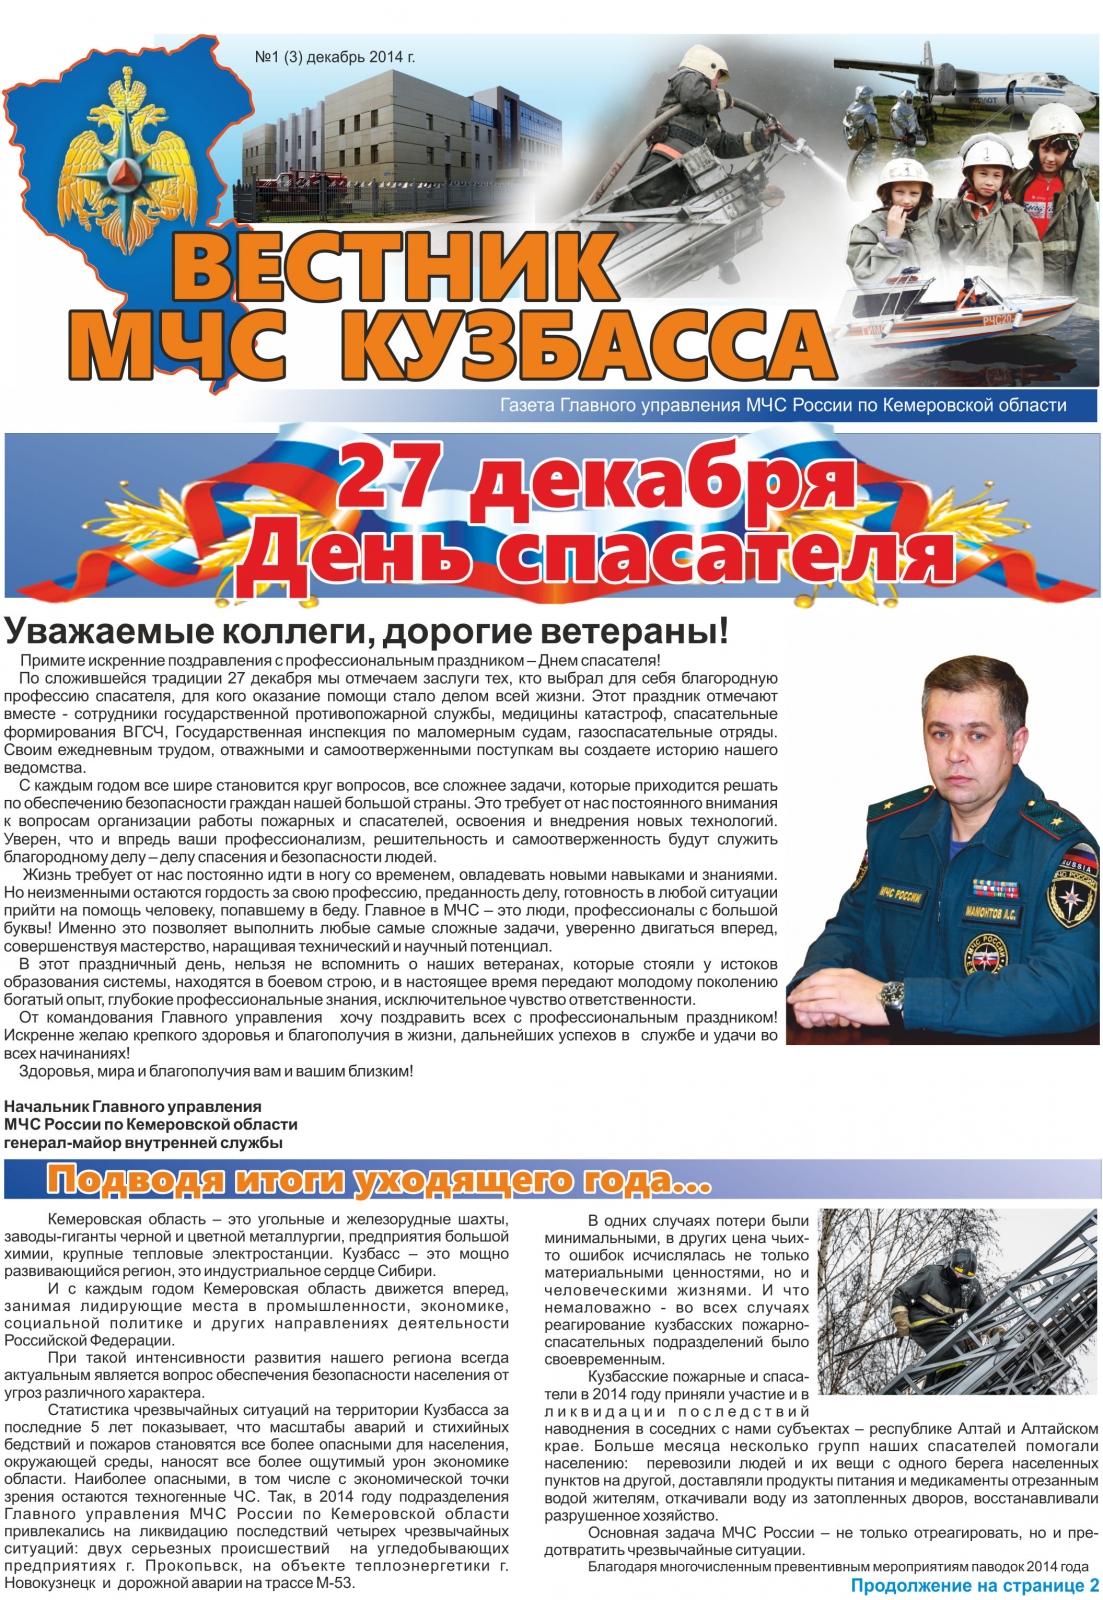 ВЕСТНИК МЧС КУЗБАССА, №1 (3) ДЕКАБРЬ 2014